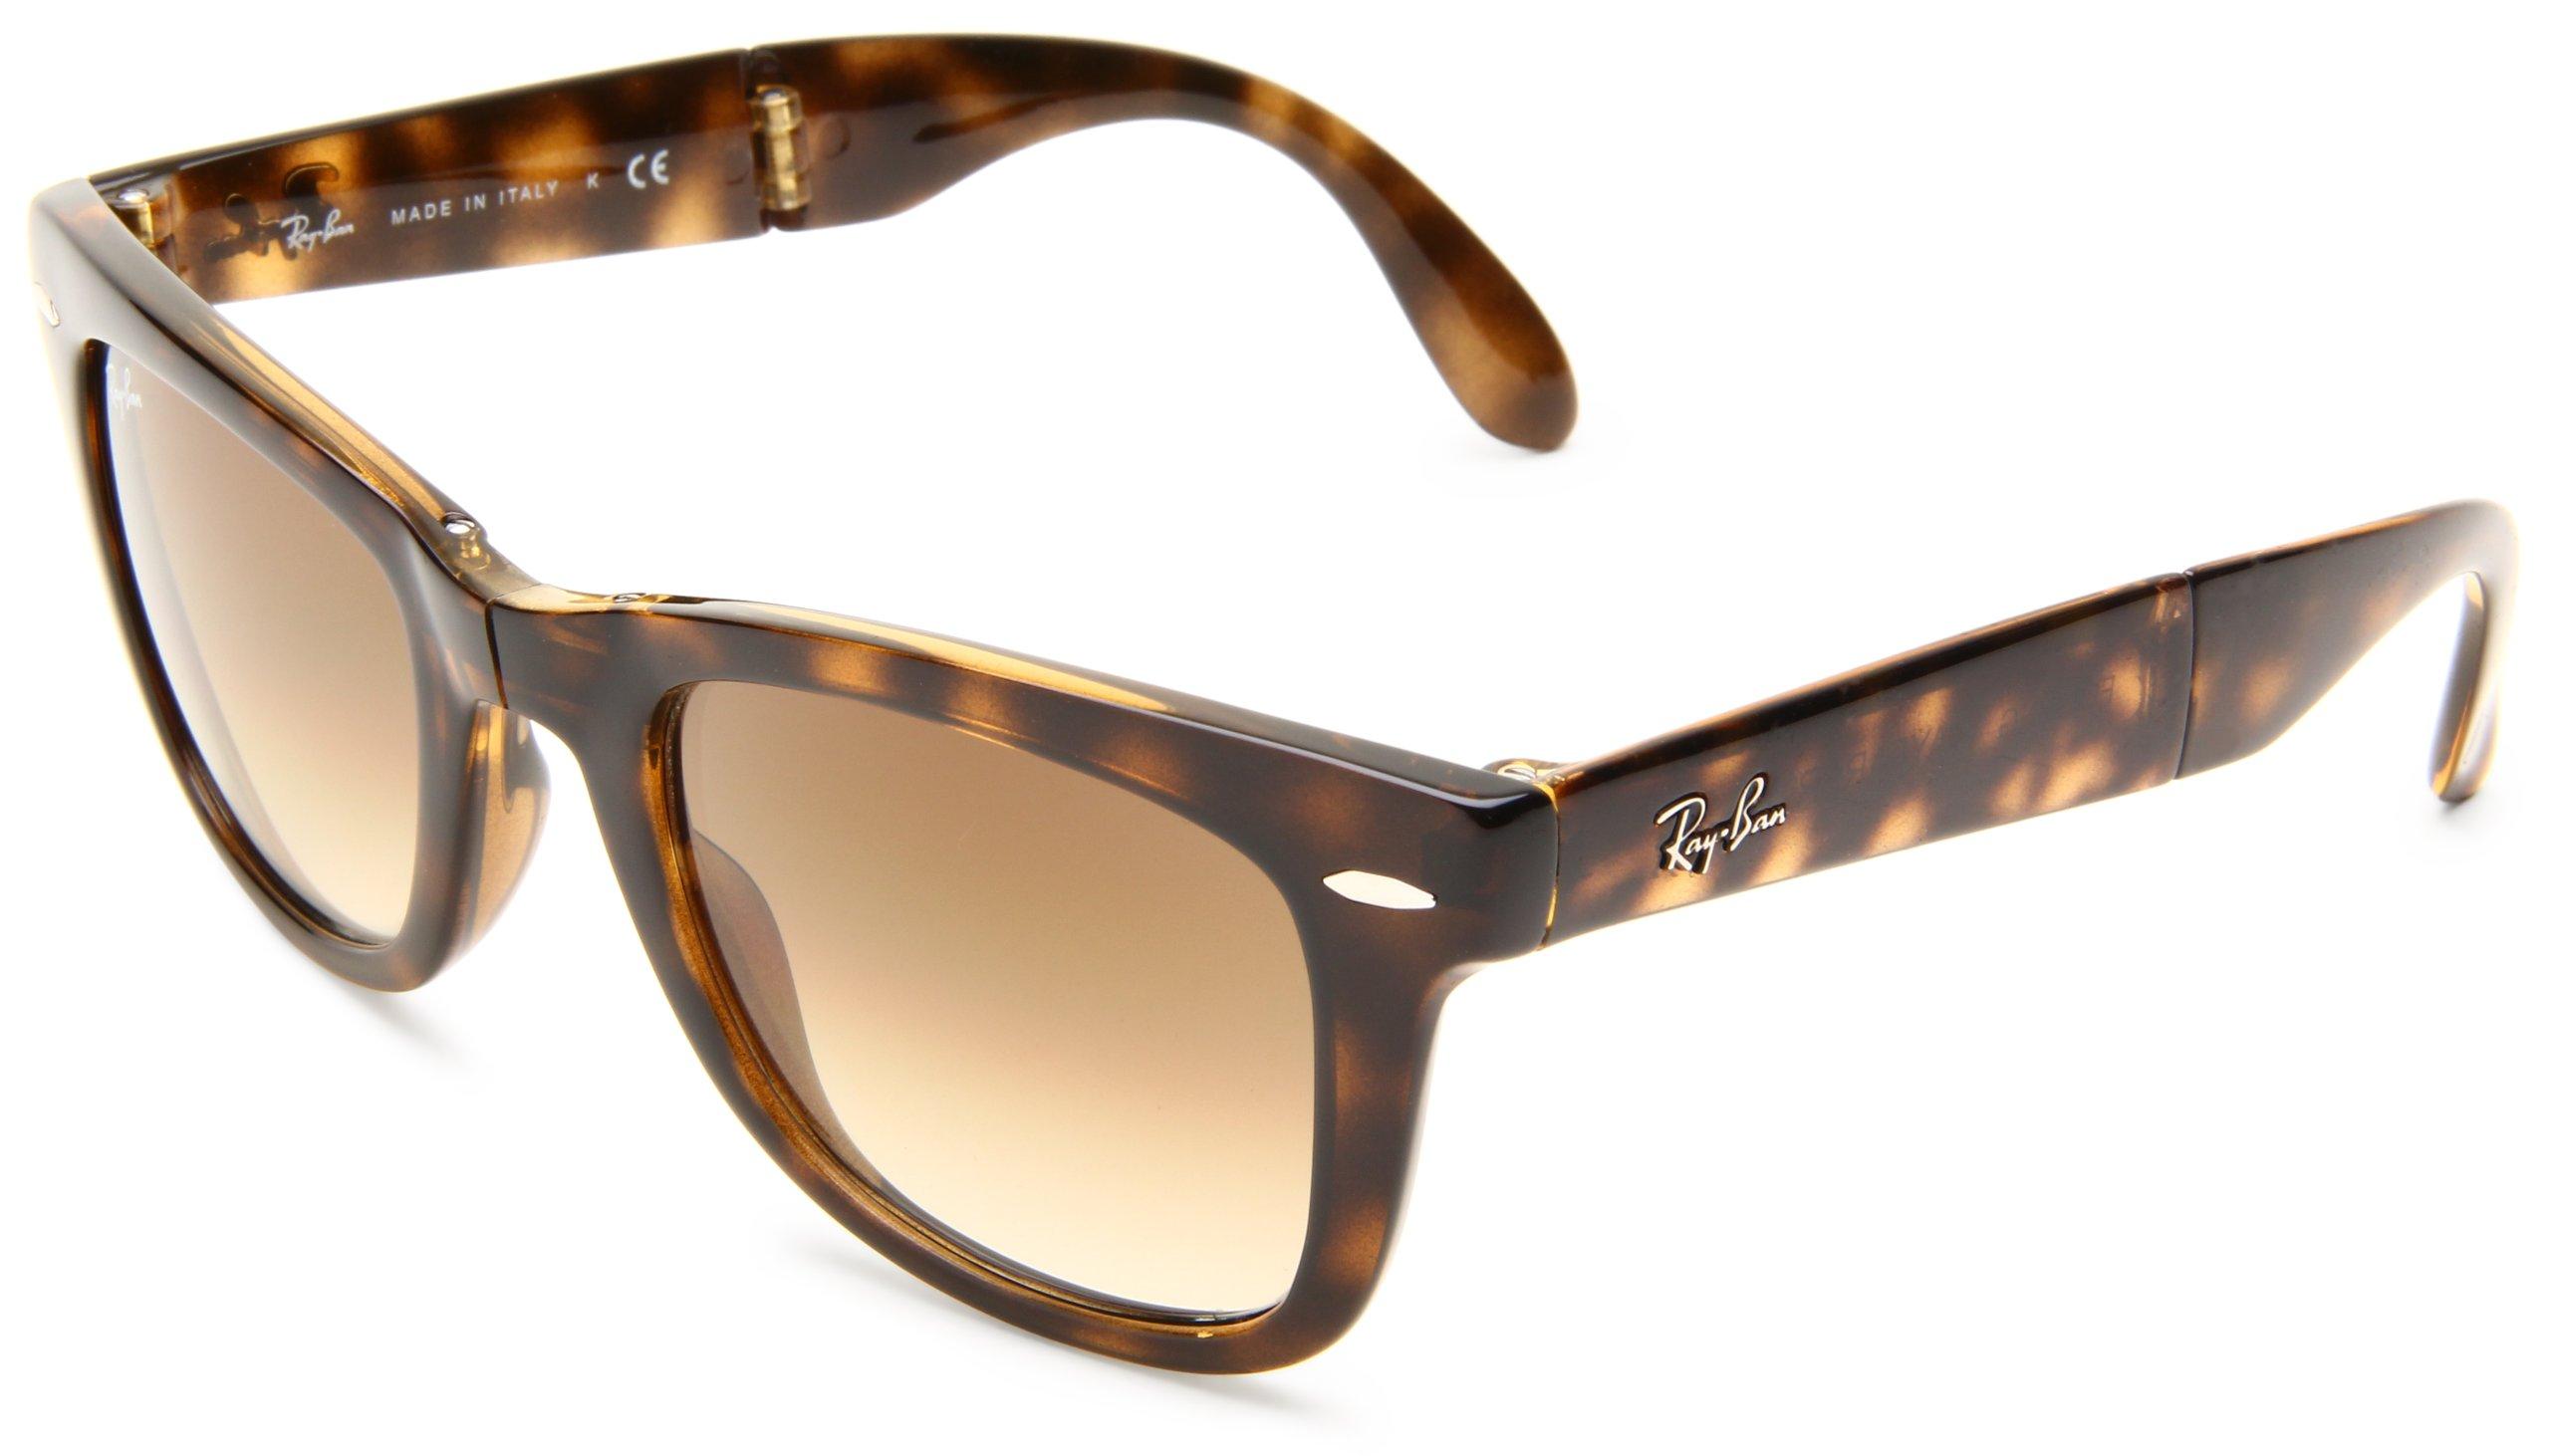 Ray-Ban Men's Folding Wayfarer Square Sunglasses, Light Havana & Crystal Brown, 50 mm